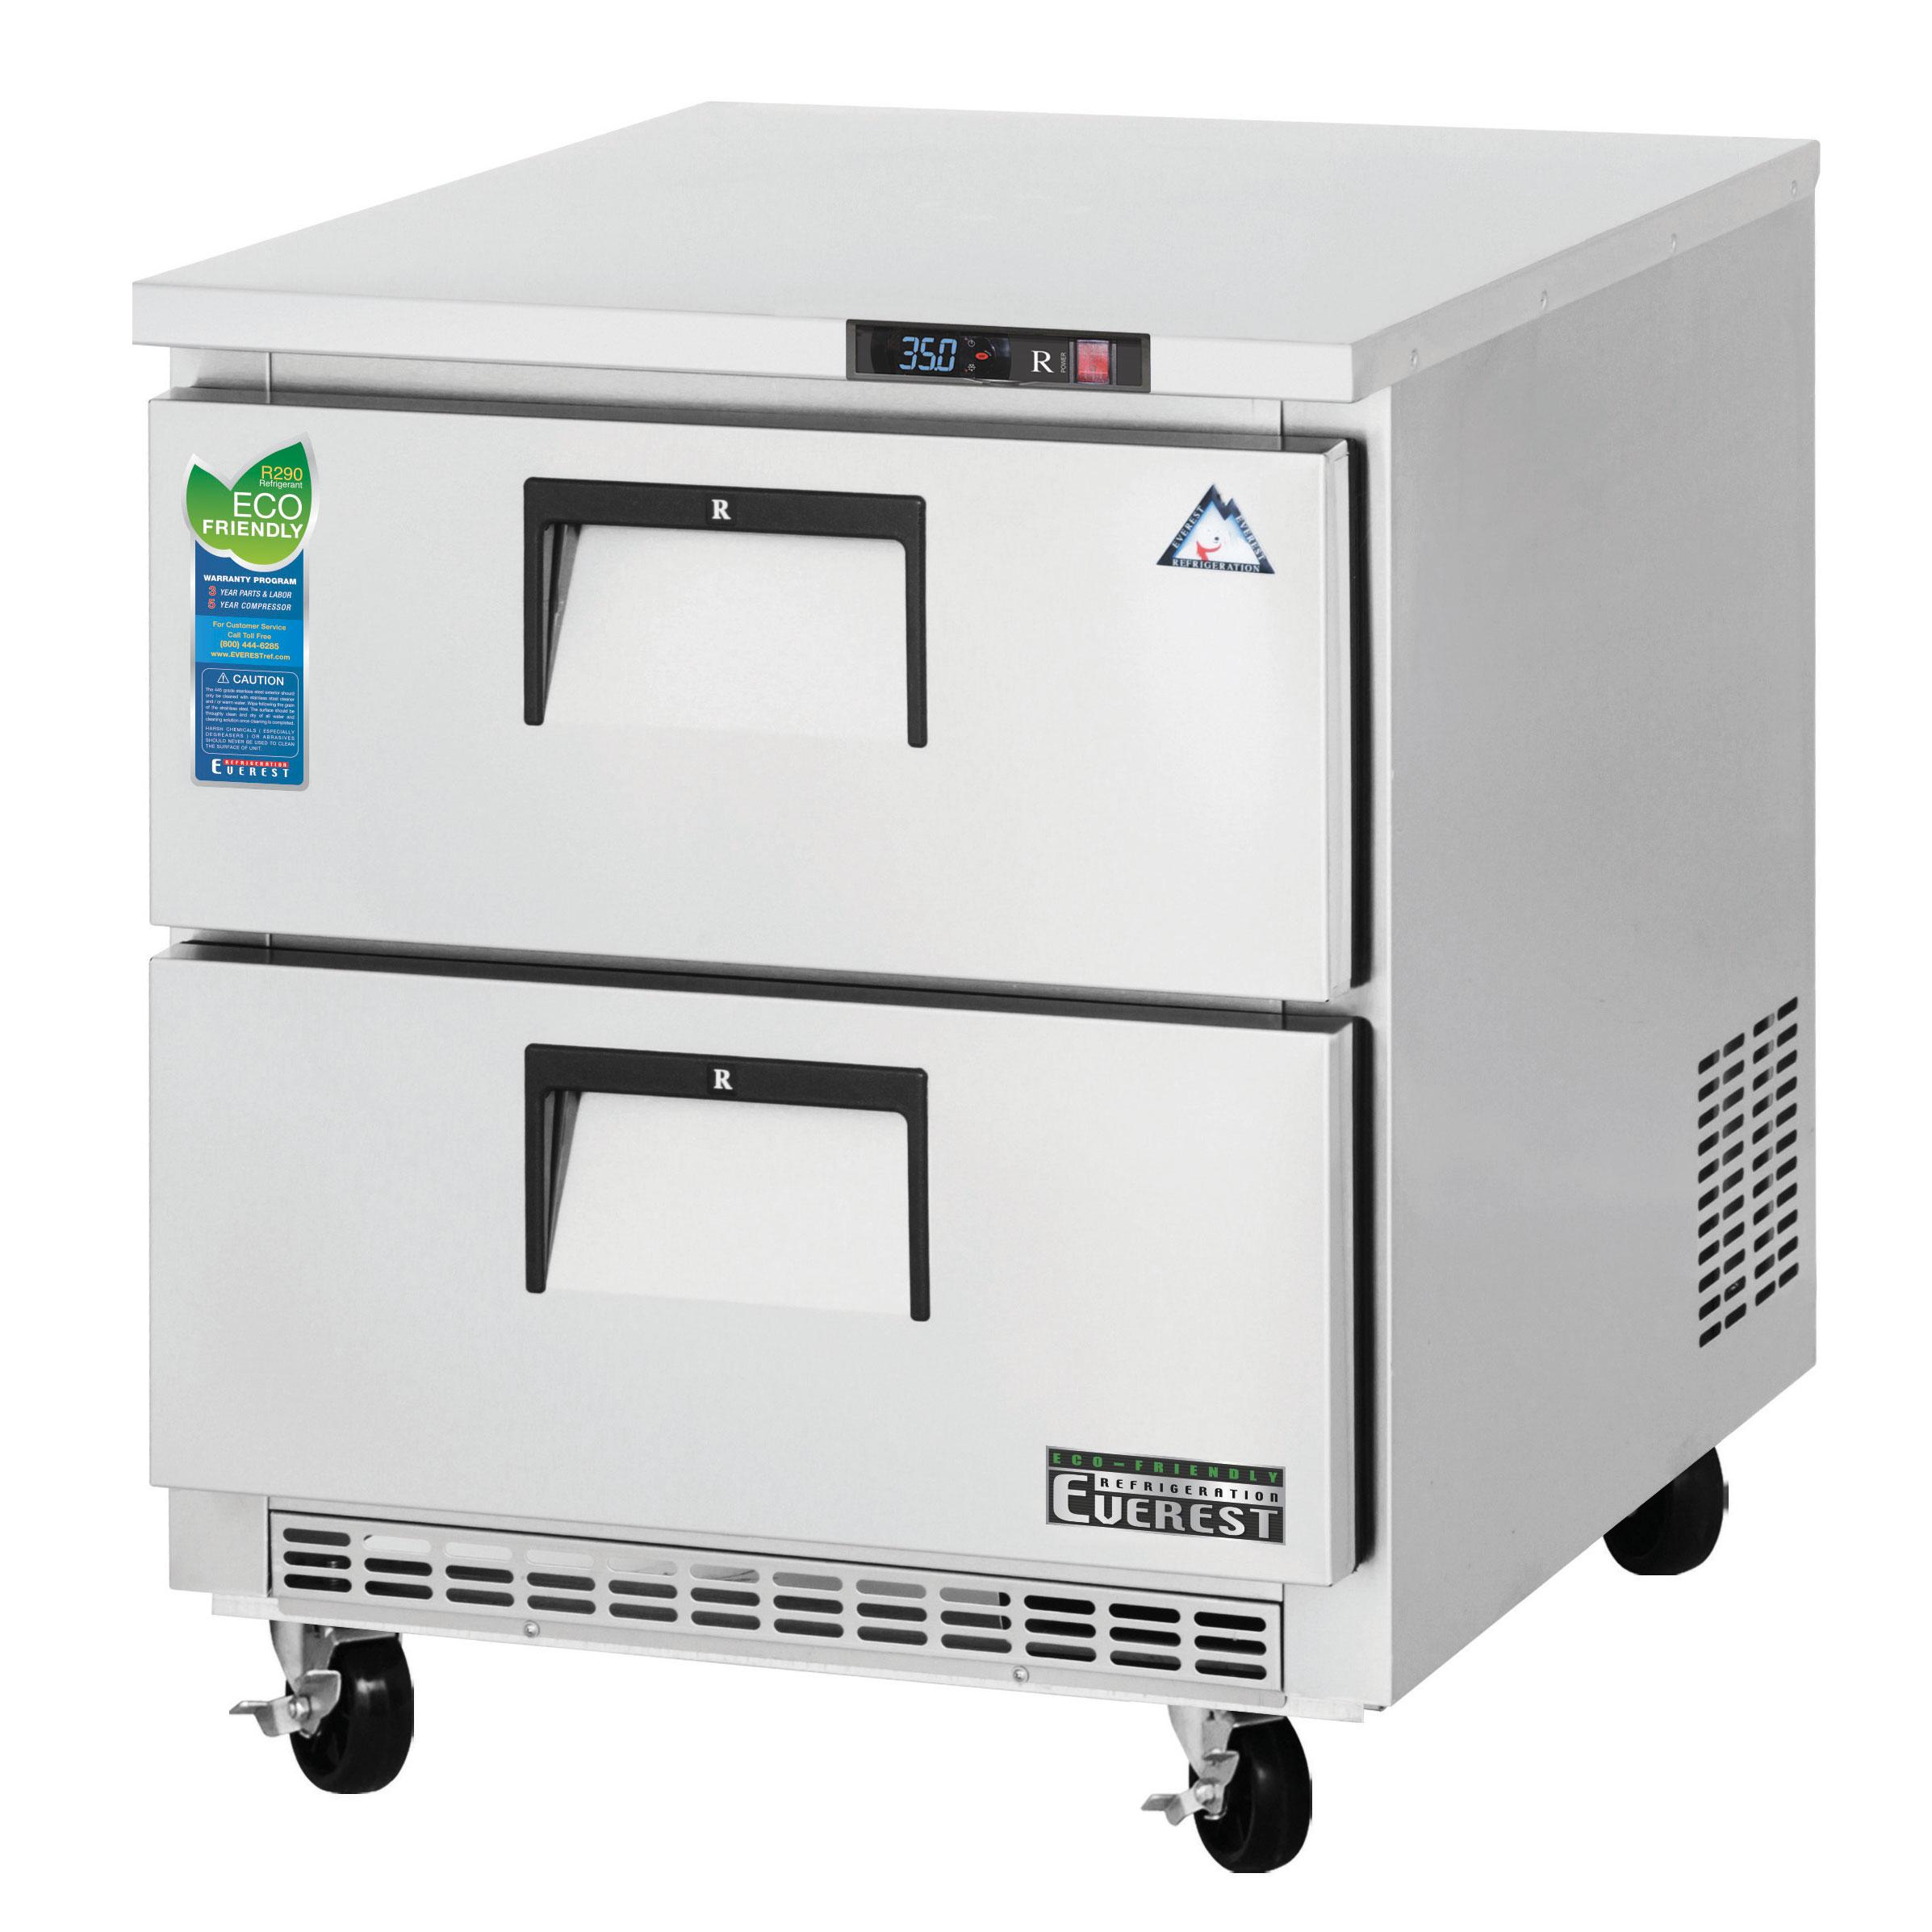 Everest Refrigeration ETBR1-D2 refrigerator, undercounter, reach-in